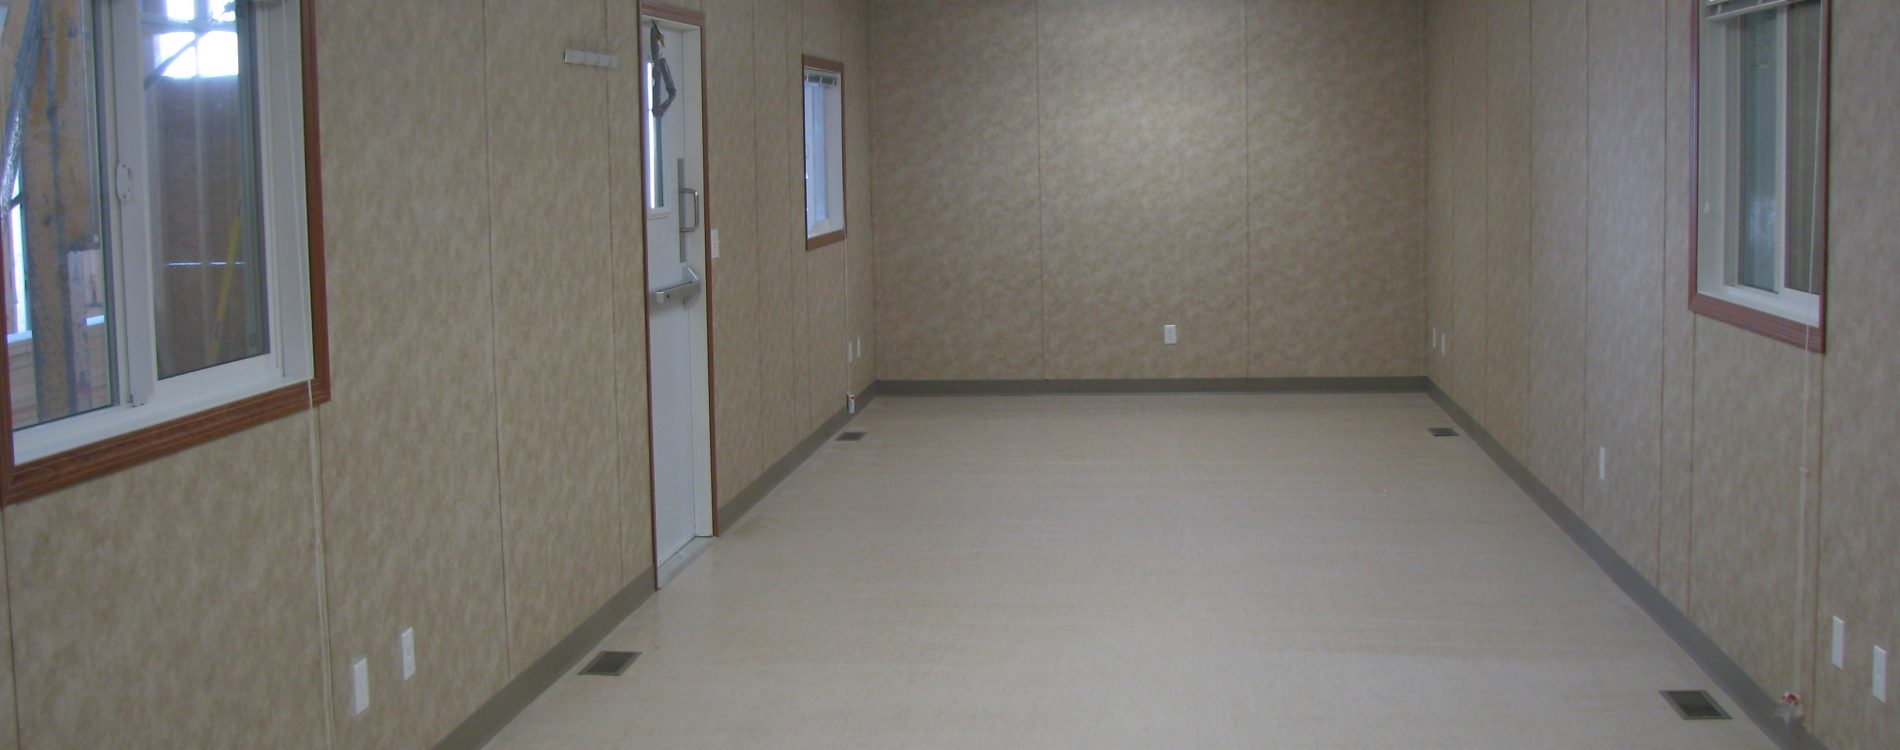 12x60 Open Skidded Office